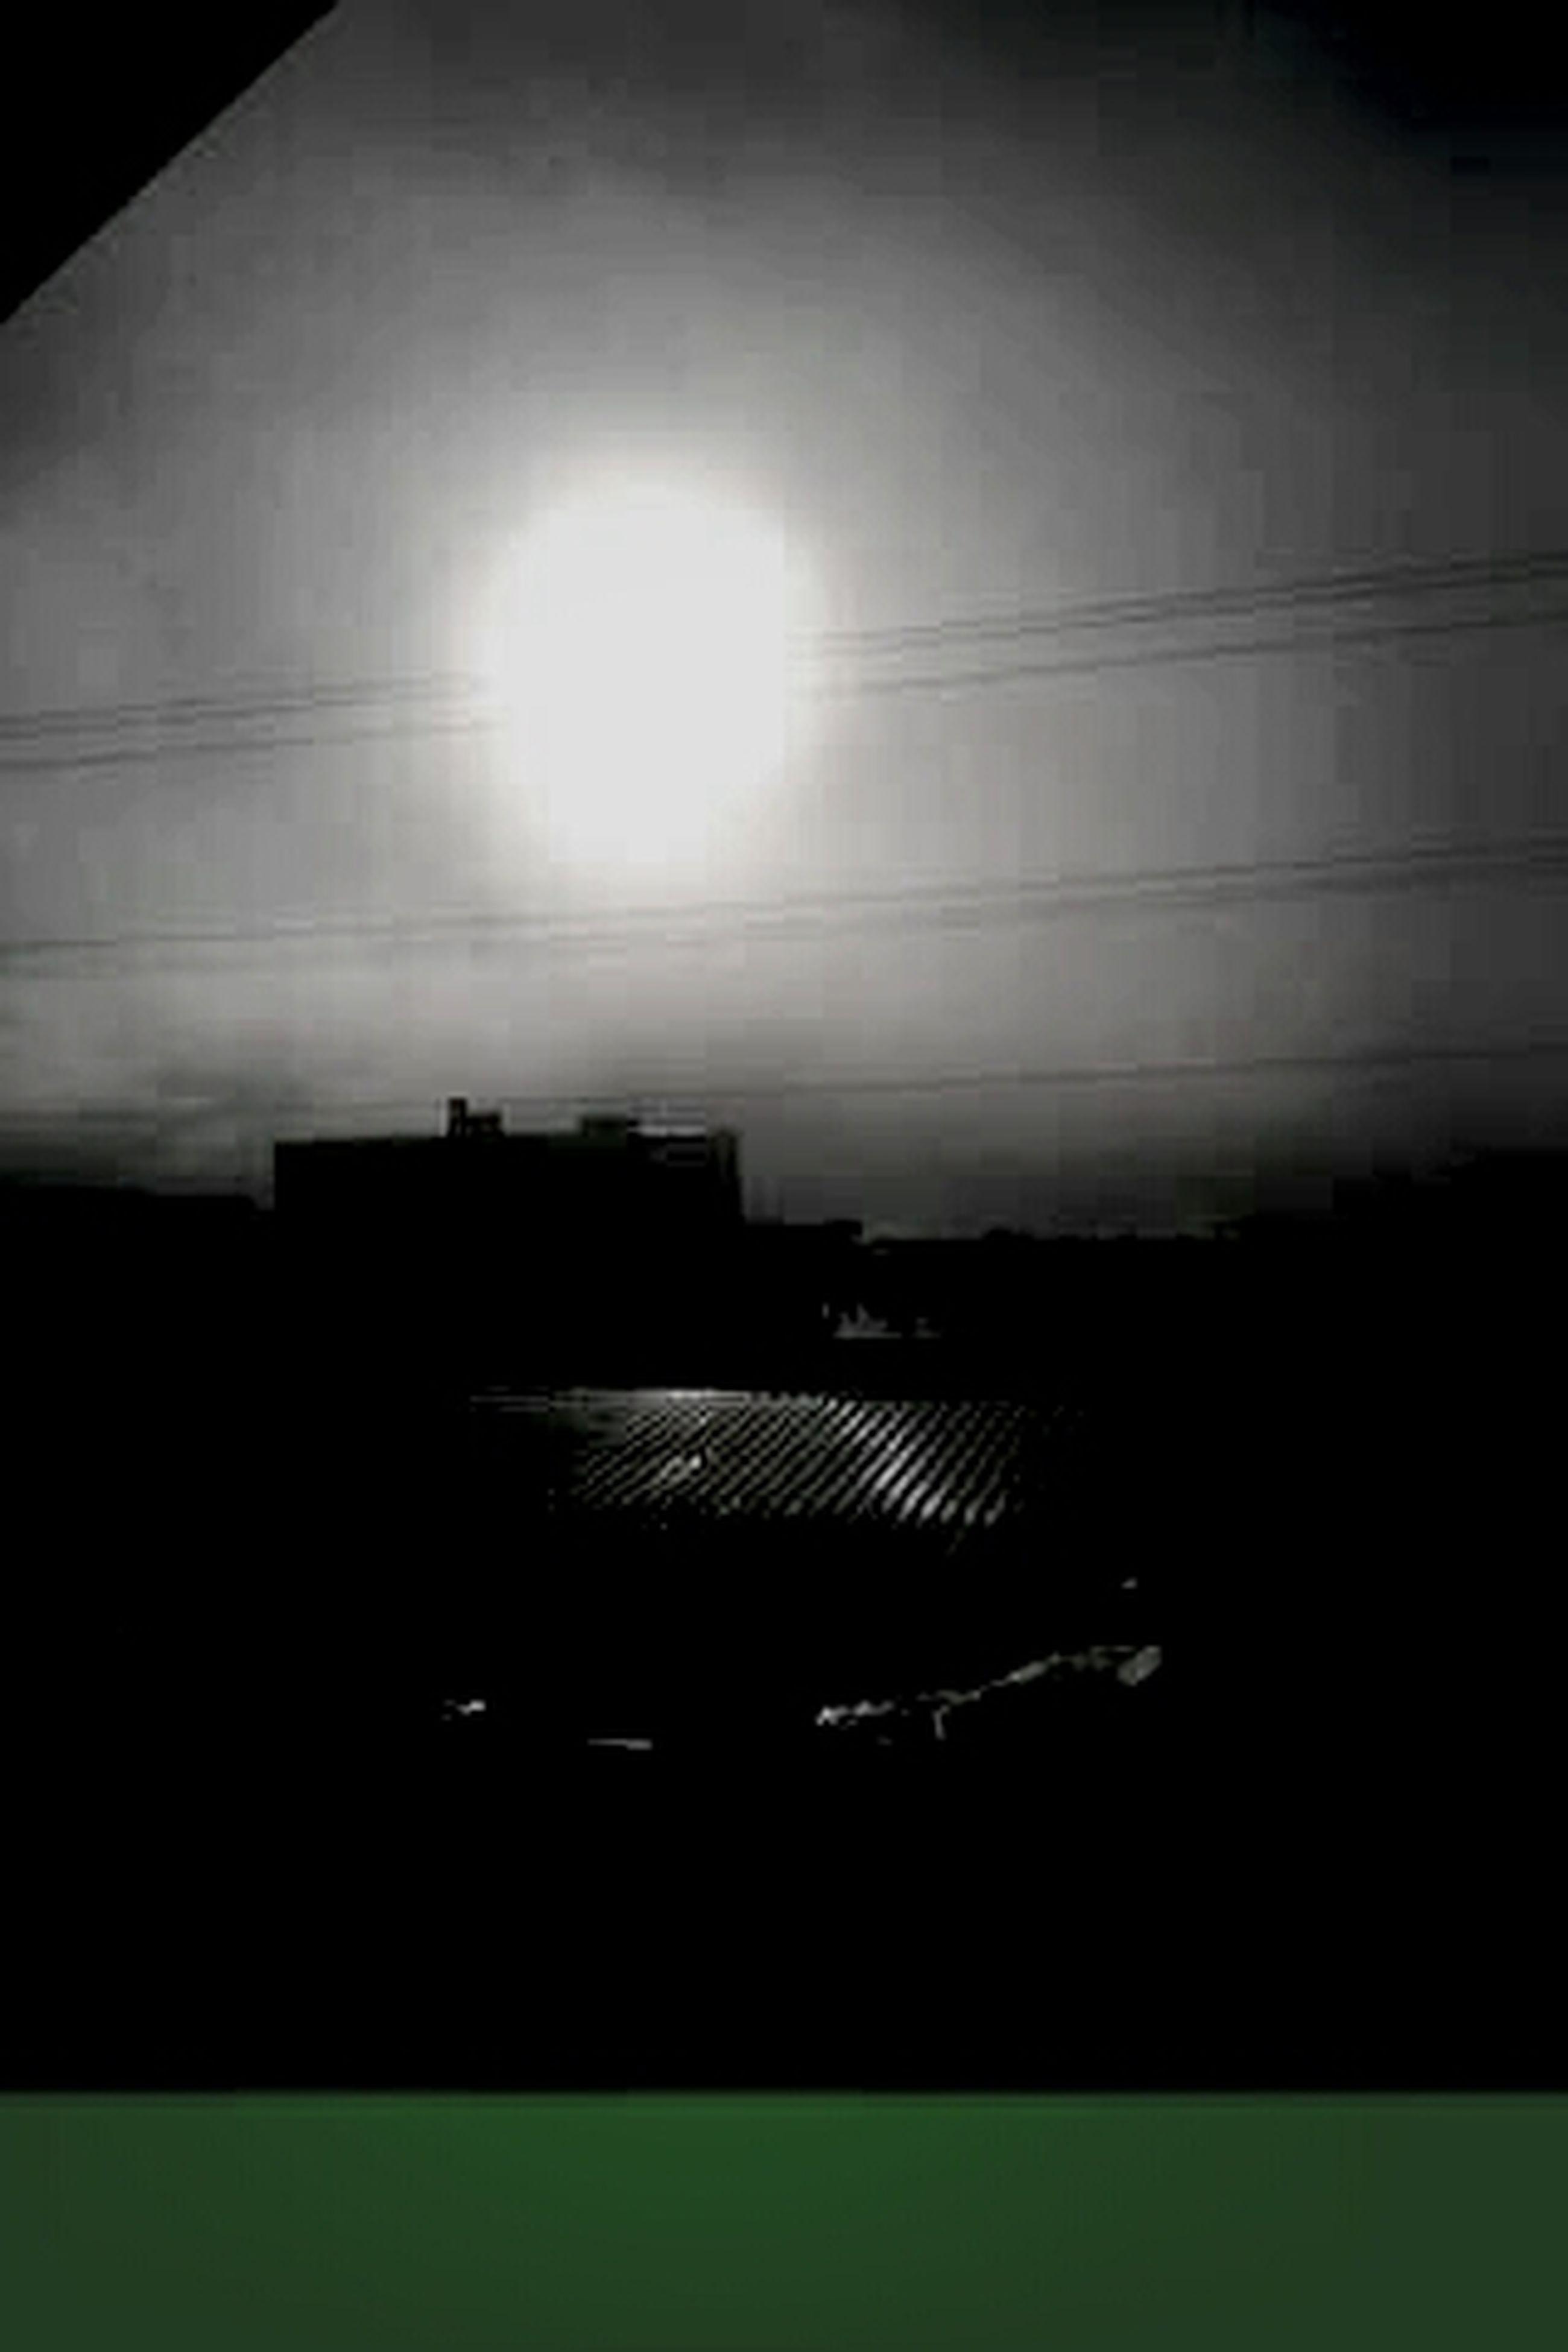 built structure, architecture, building exterior, sky, silhouette, low angle view, window, sun, dark, building, sunlight, power line, no people, outdoors, sunset, cloud - sky, dusk, auto post production filter, nature, city